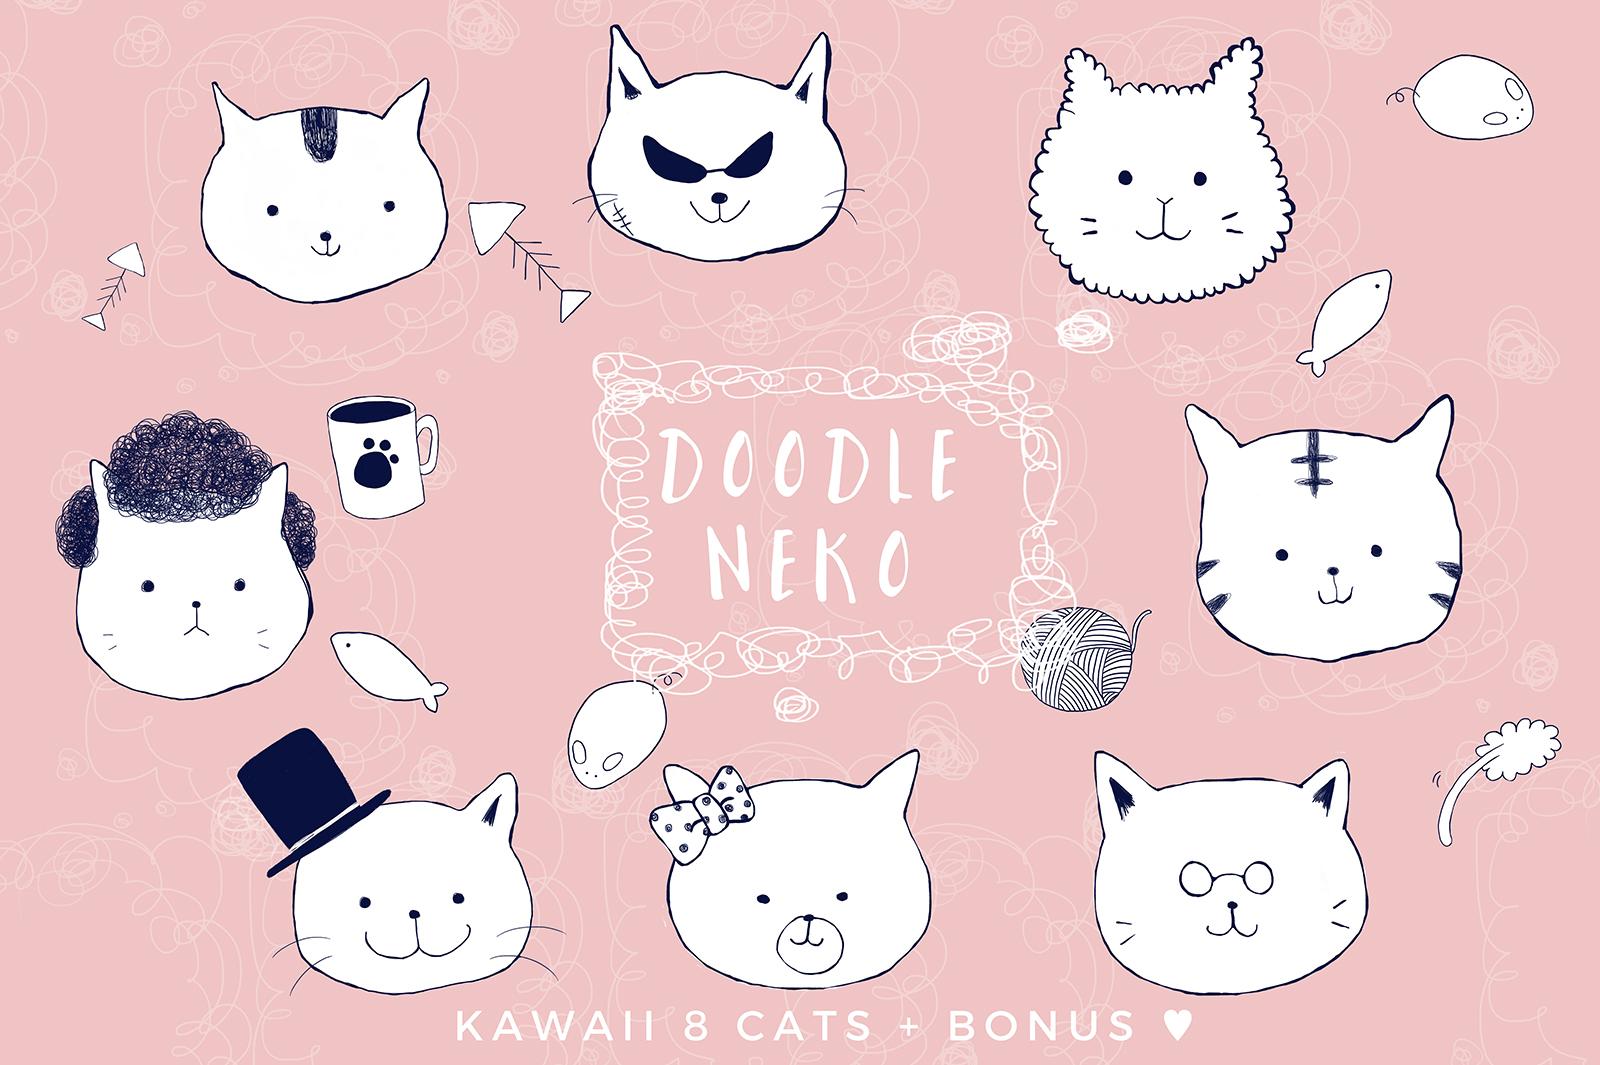 Doodle Neko - Cat Illustrations example image 1